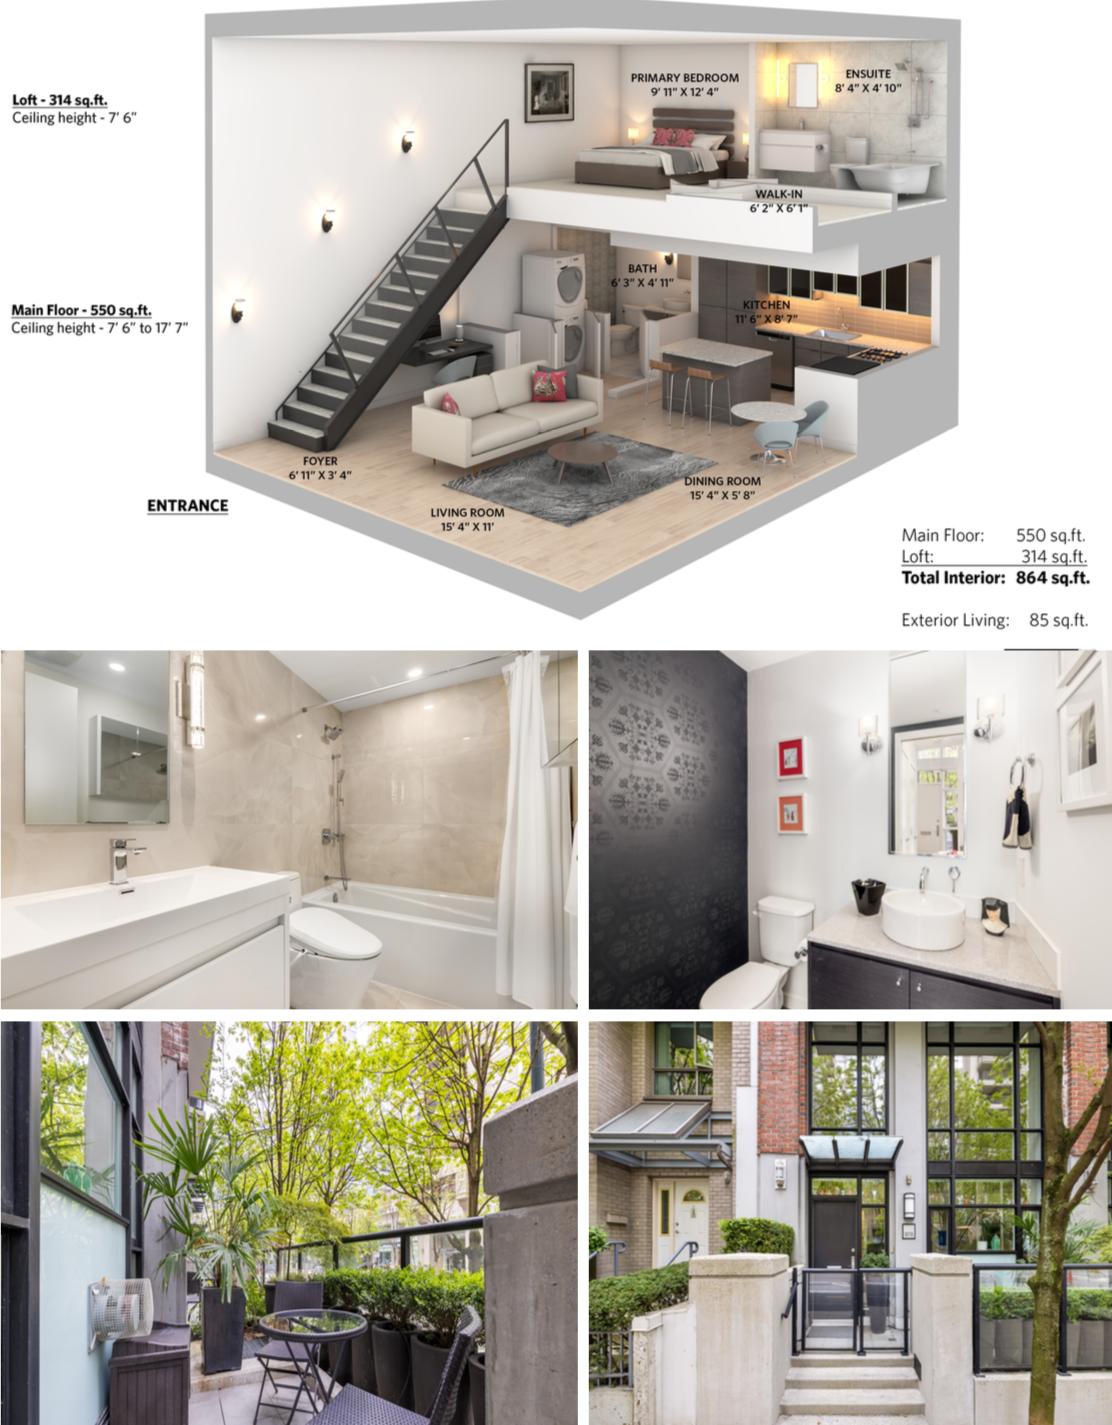 988 richards street loft and condos c